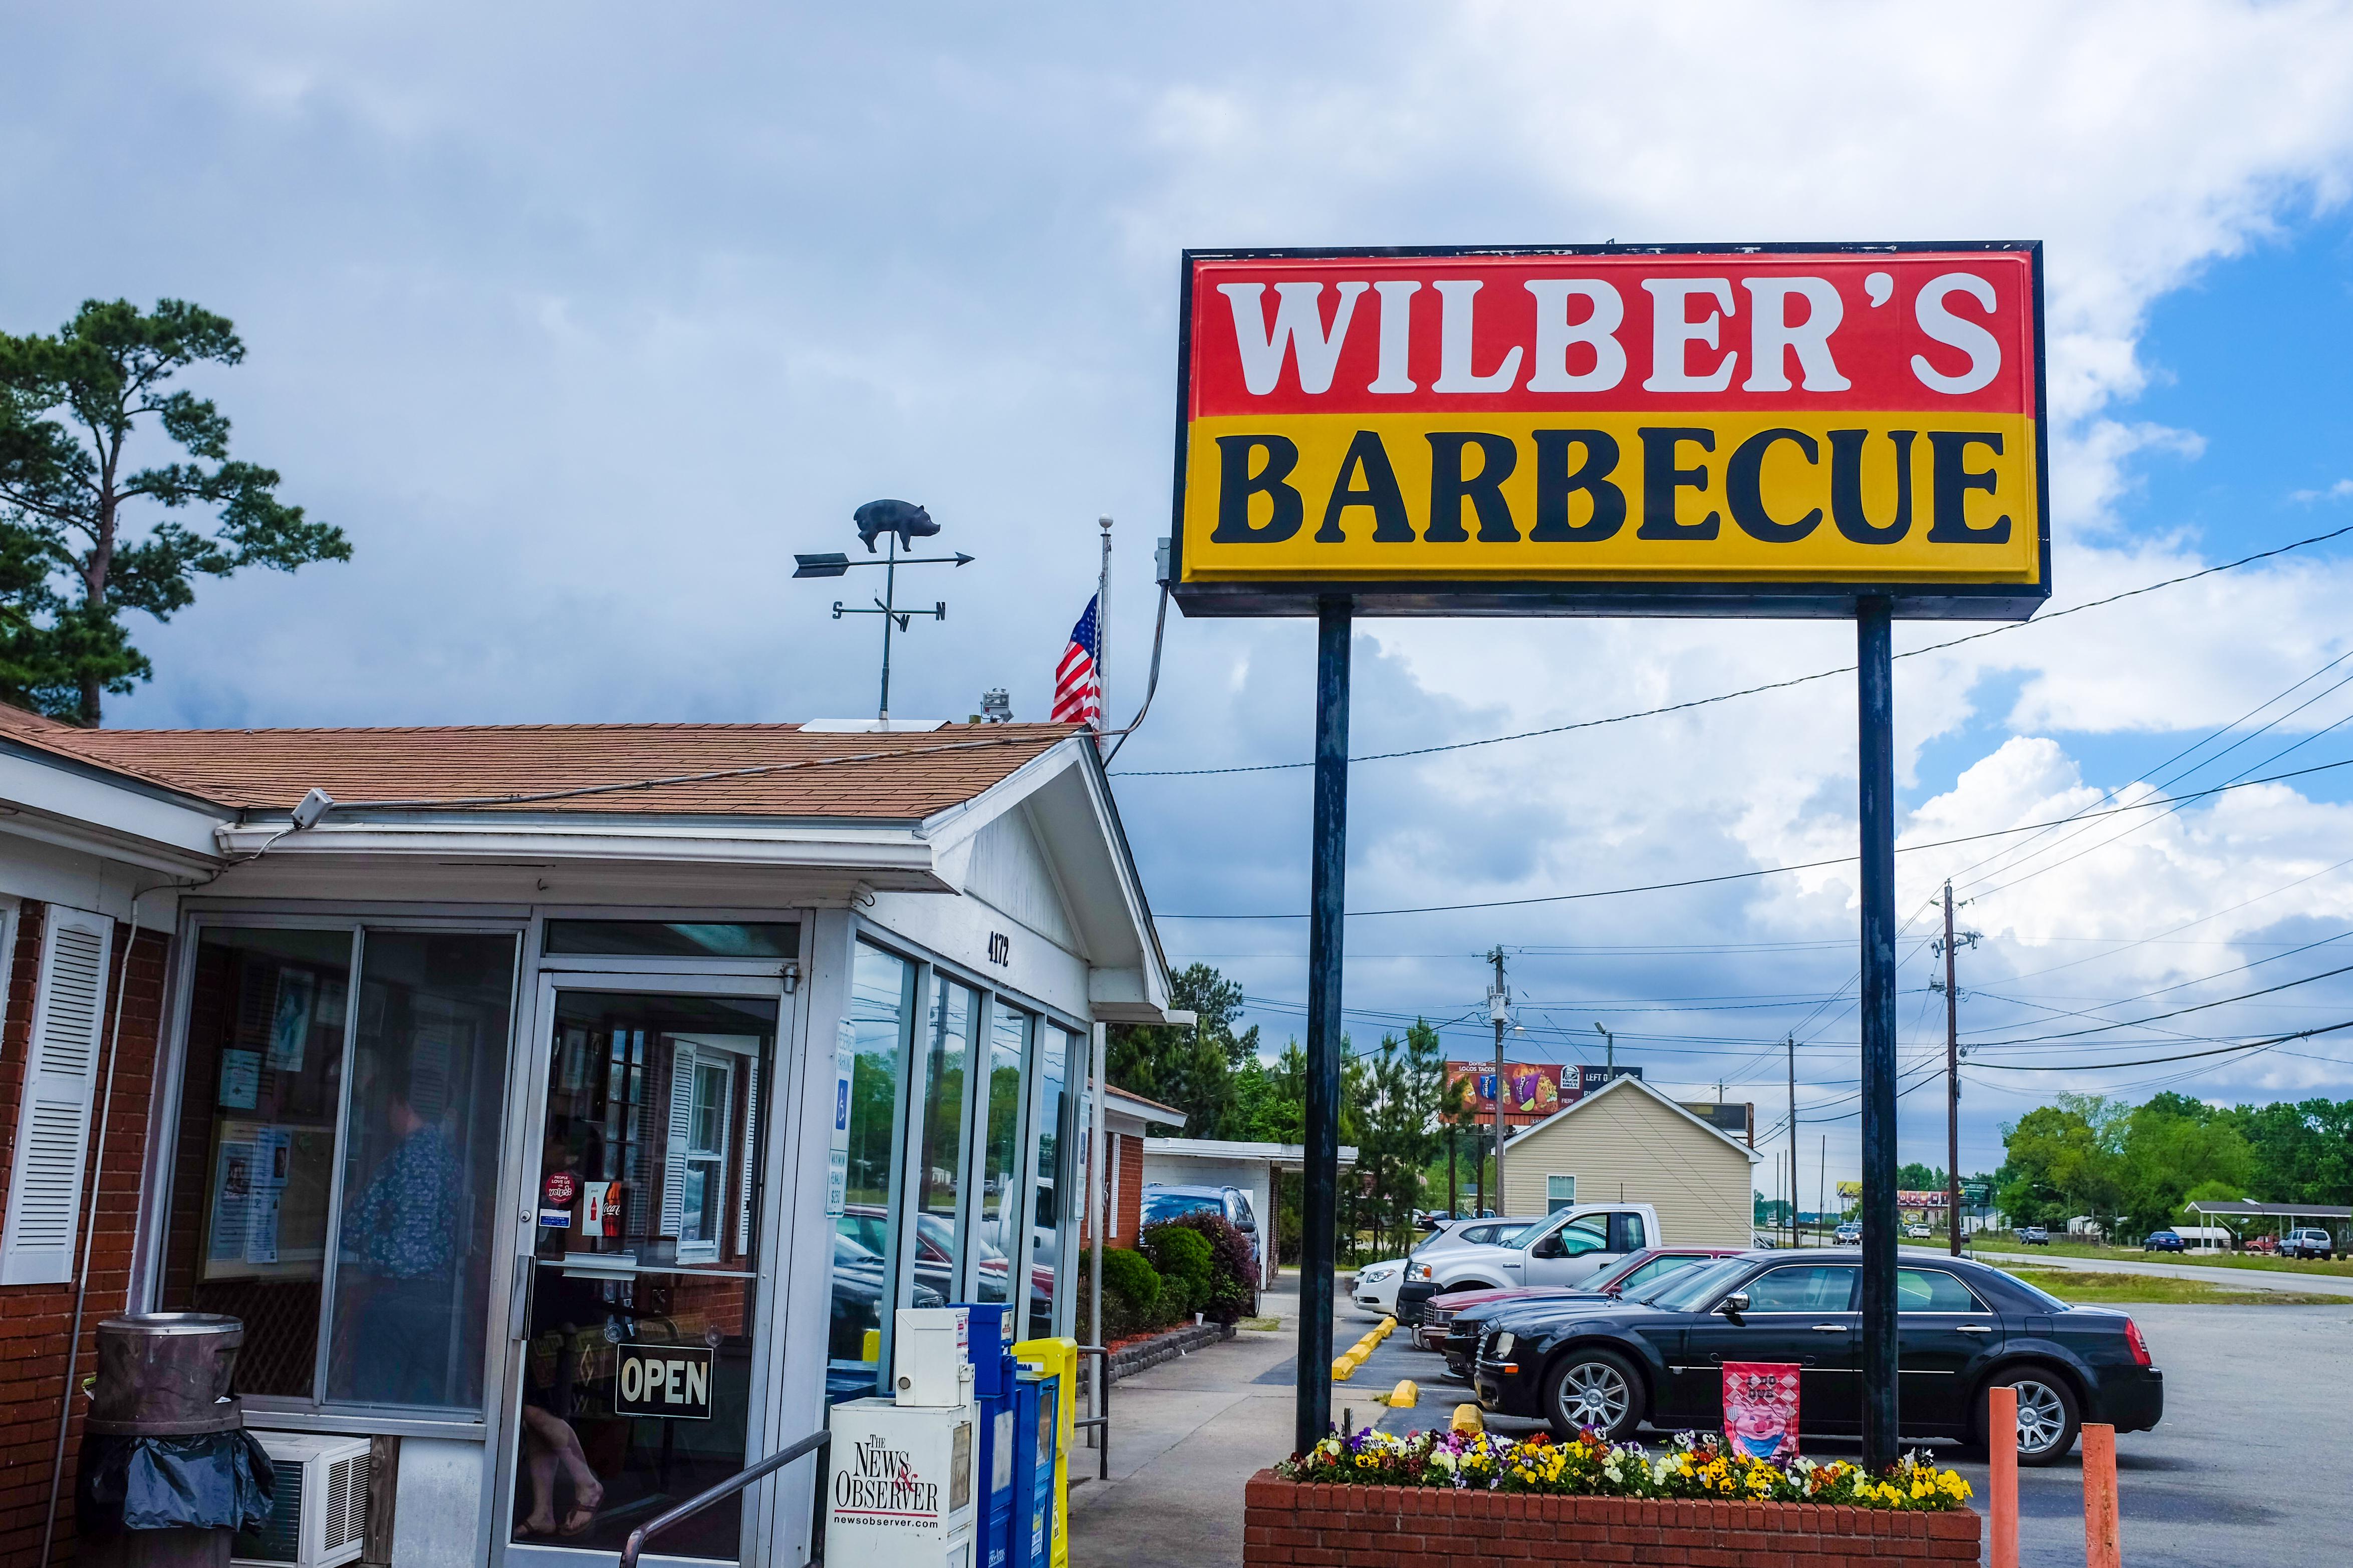 Destination North Carolina: A Southern Food Road Trip Extravaganza ...